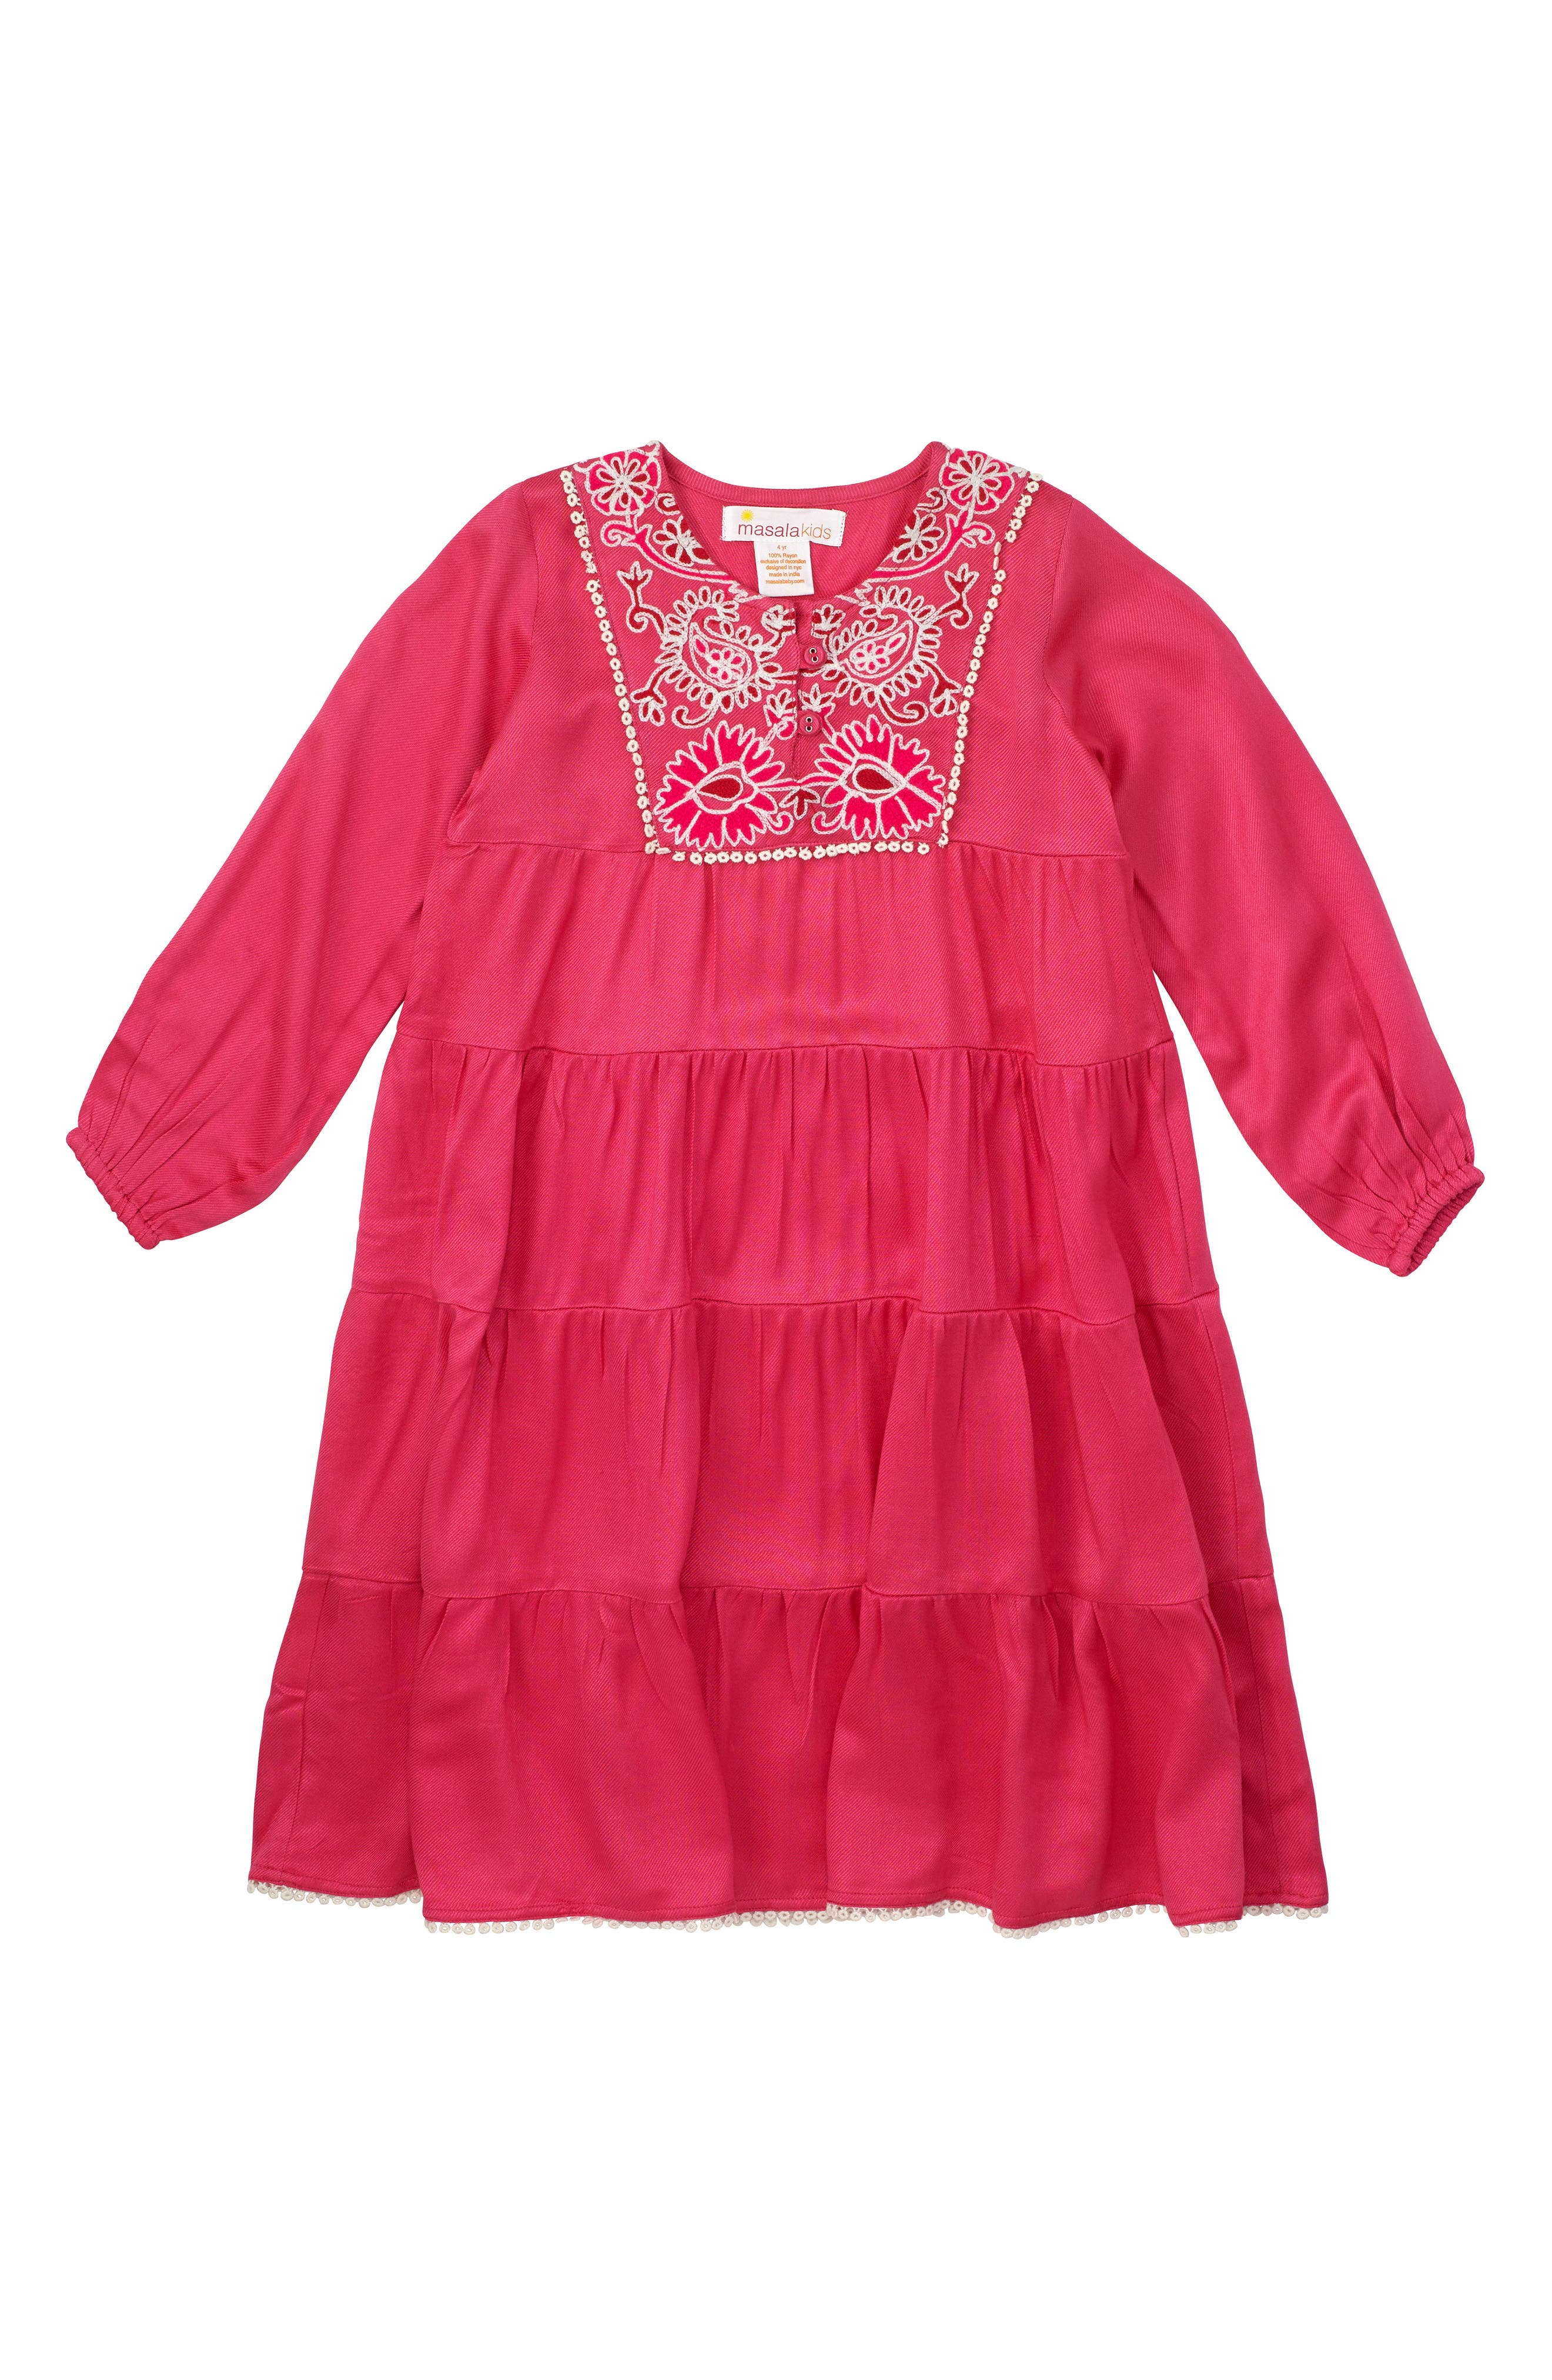 Rose Dress,                             Alternate thumbnail 3, color,                             670